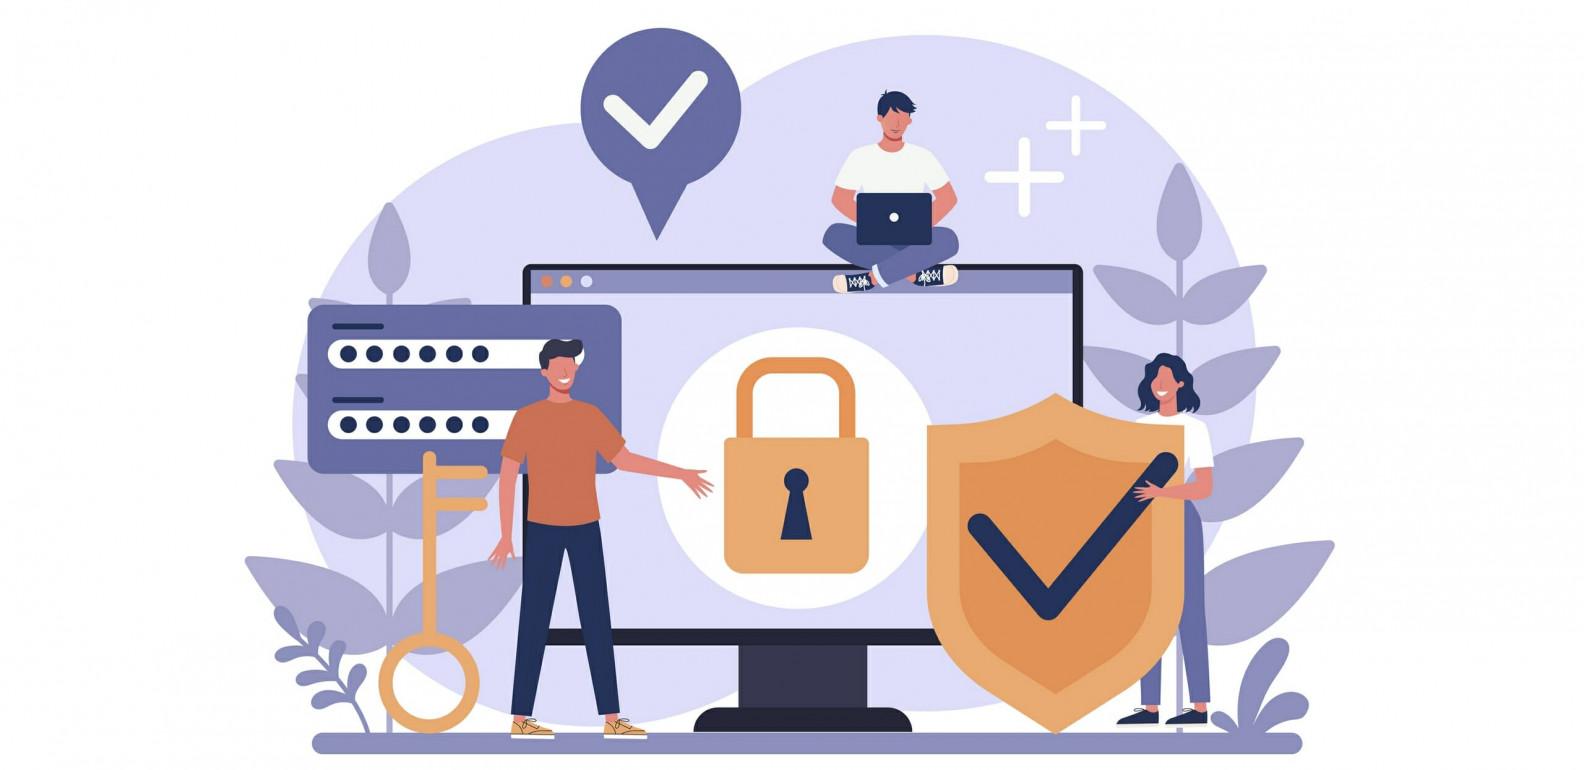 Schutz personenbezogener Daten